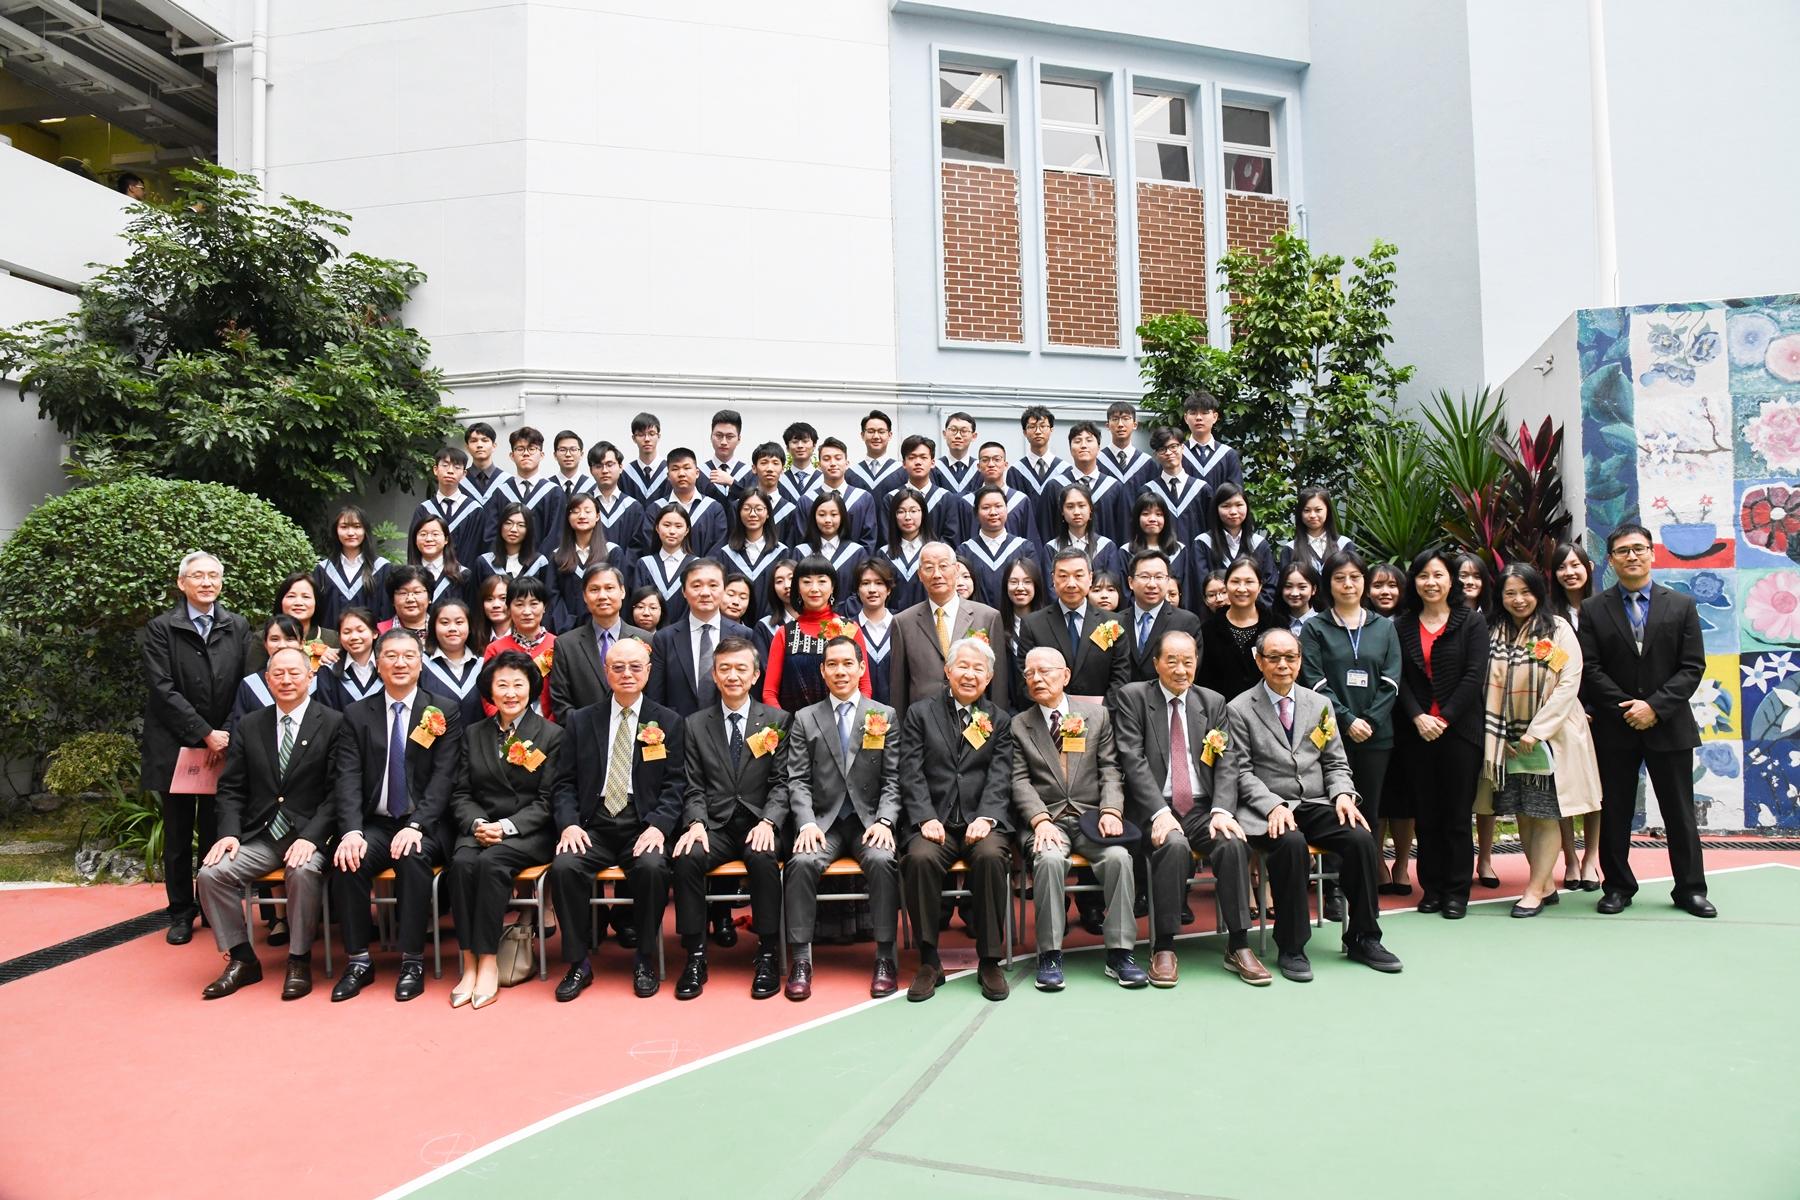 https://npc.edu.hk/sites/default/files/09_dsc_0642.jpg